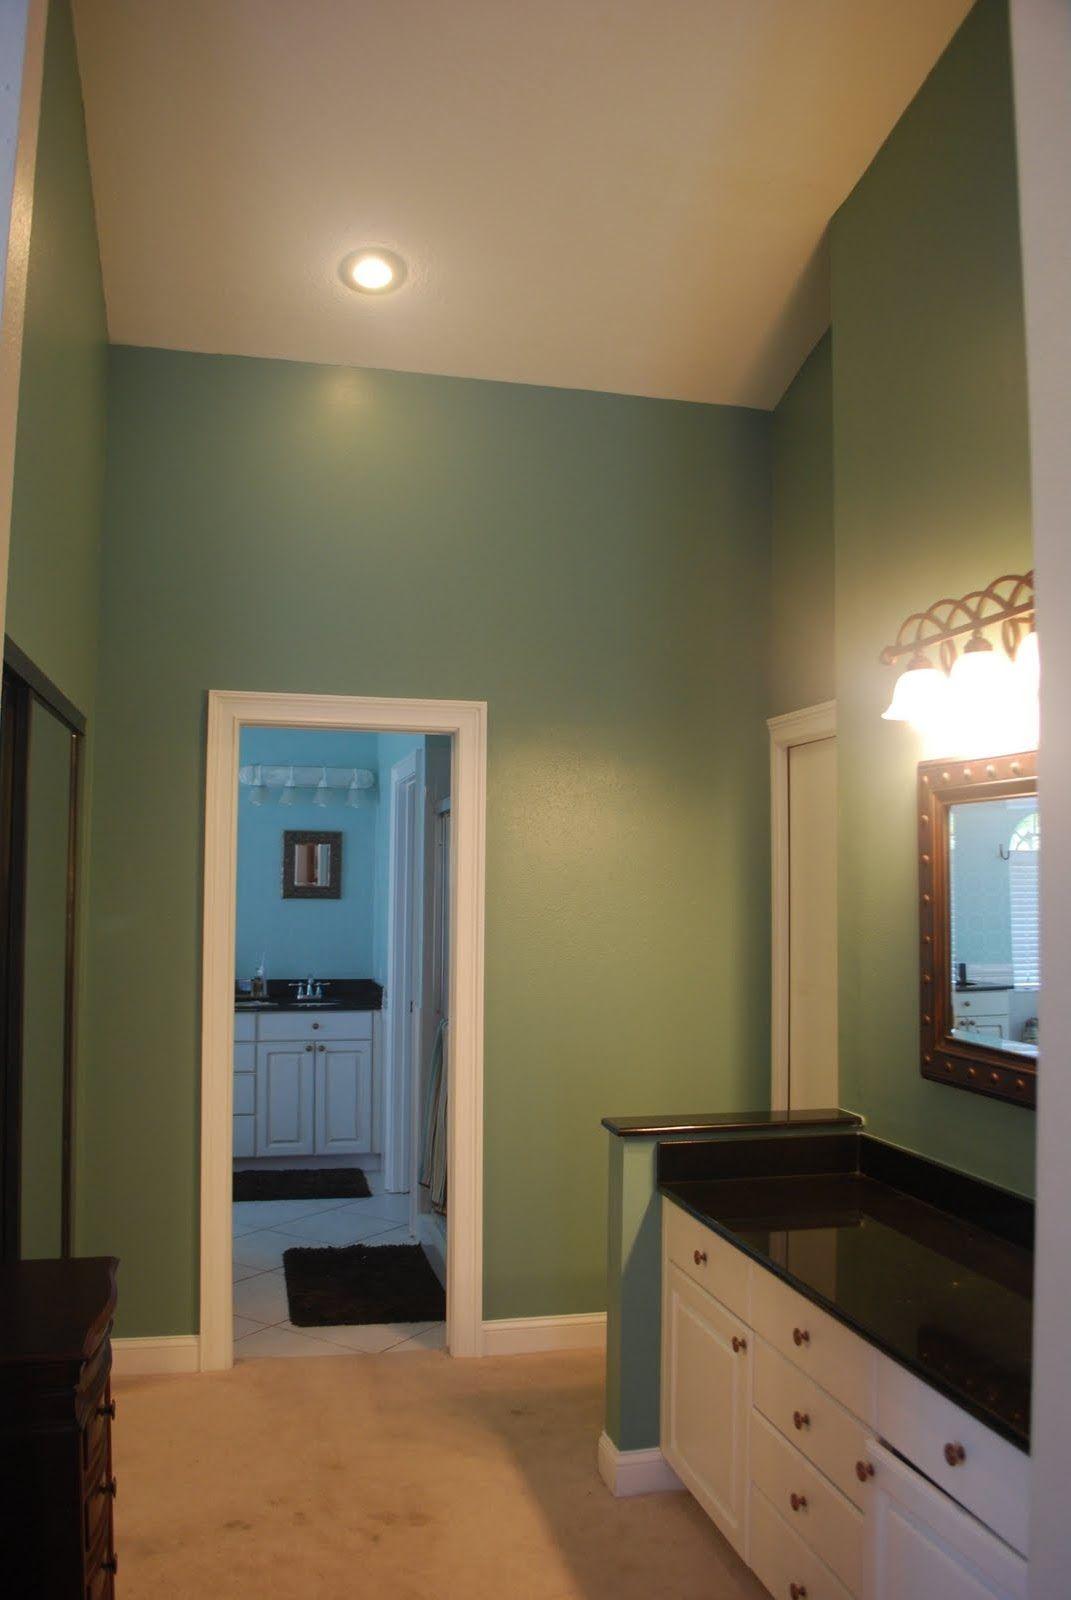 Bathroom paint ideas behr - Bathroom Pleasing White Lighting With Bathroom Vanity Set Plus Black Granite Top Small Bathroom Paint Ideas